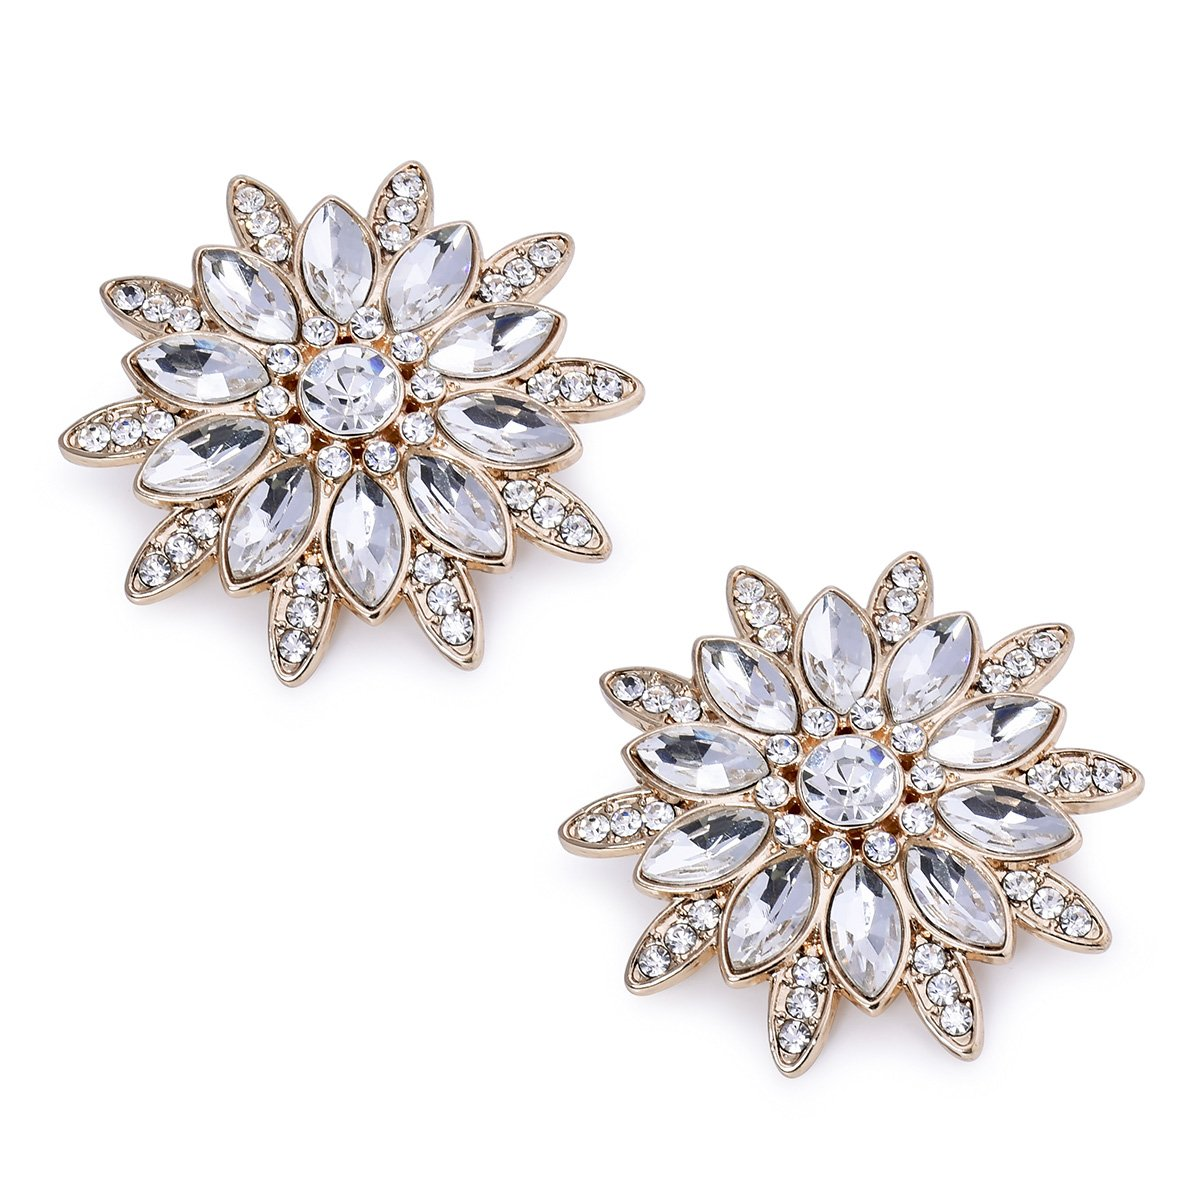 ElegantPark AS Women Sunshine Design Wedding Party Prom Decoration Crystals Clutch Dress Hat Shoe Clips 2 Pcs Gold